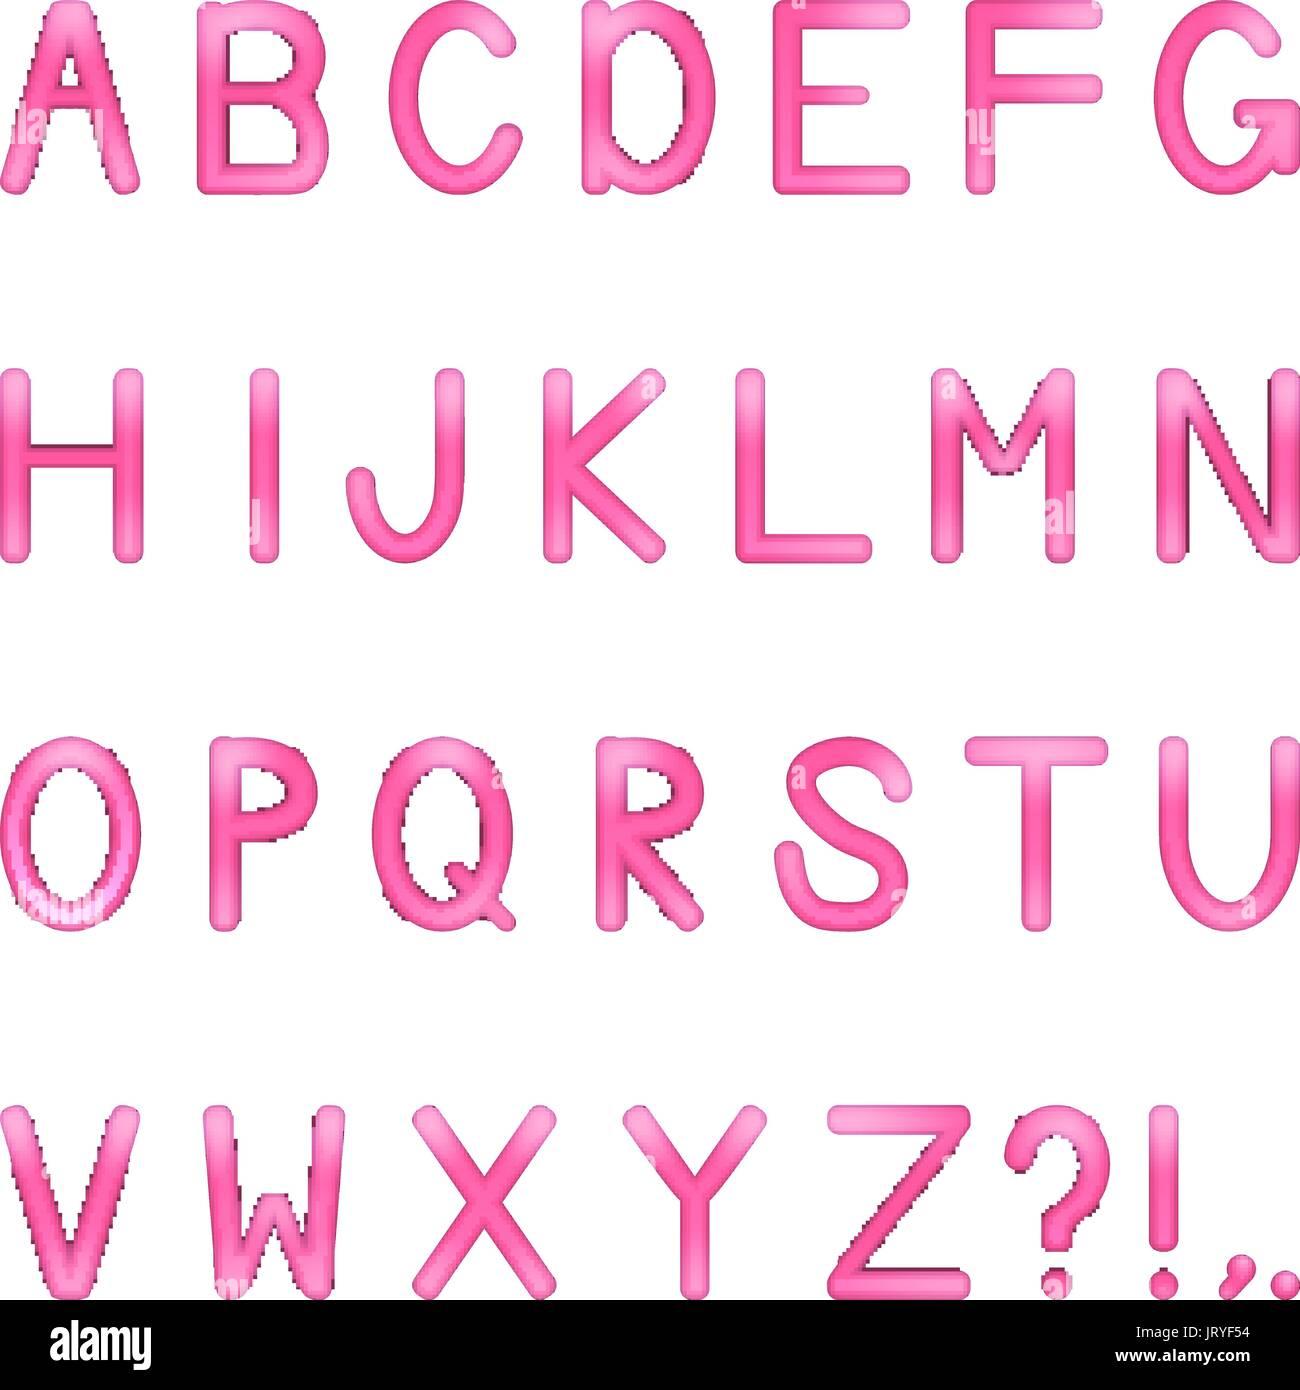 Pink Typeface Stock Photos & Pink Typeface Stock Images - Alamy